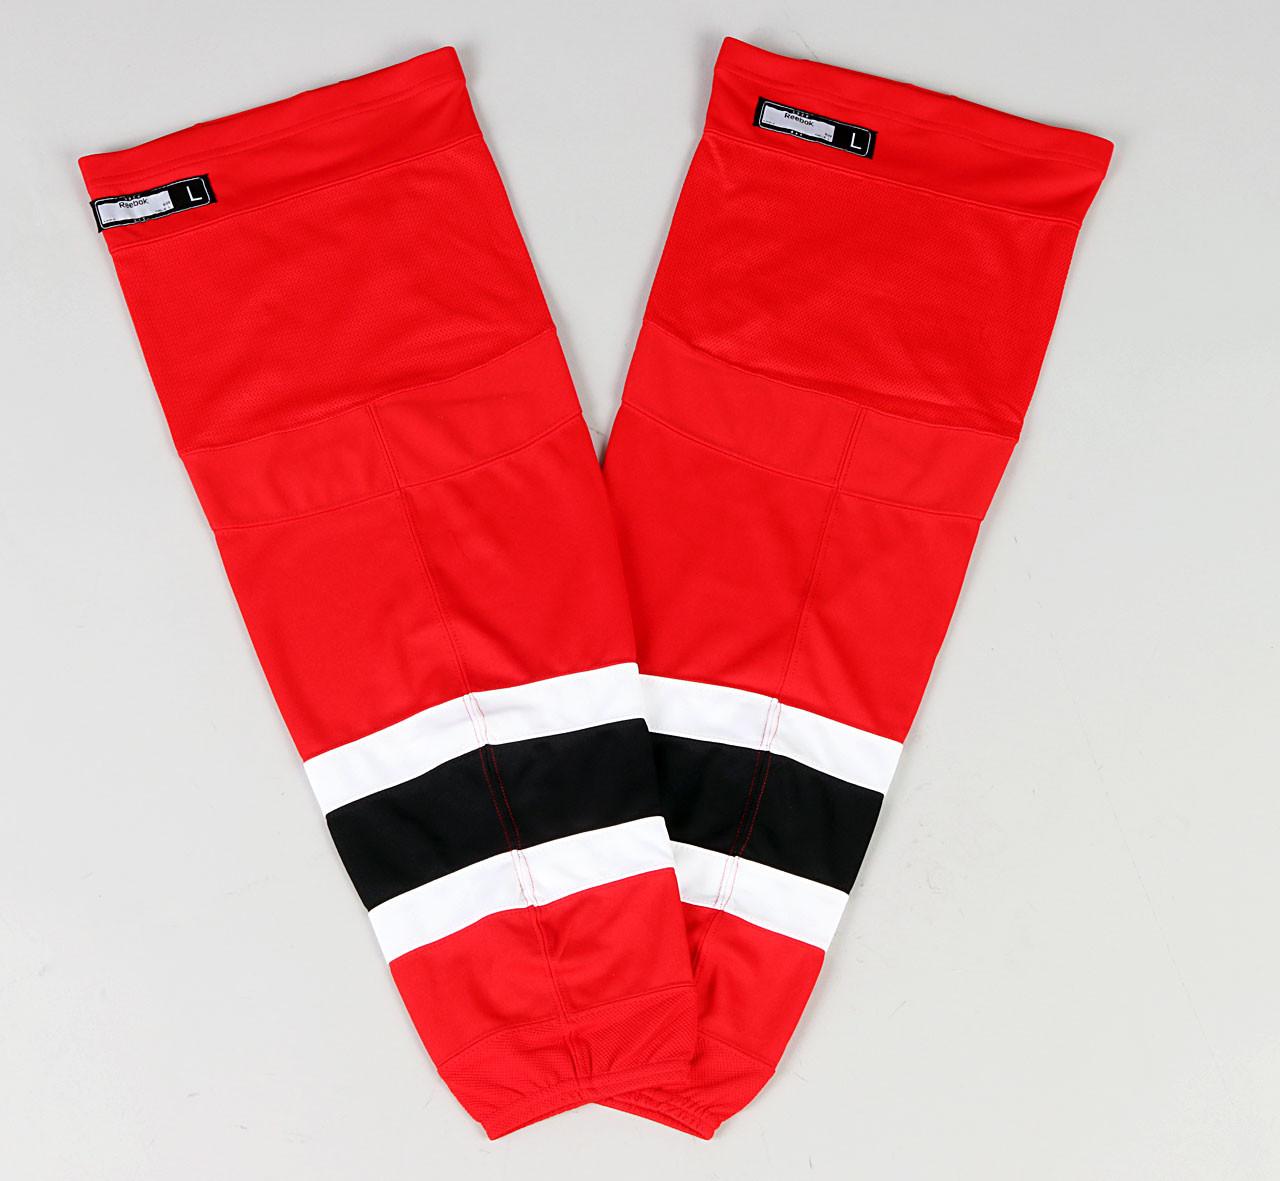 best service b0674 b9d51 Game Sock - New Jersey Devils - Red Reebok Size L #2